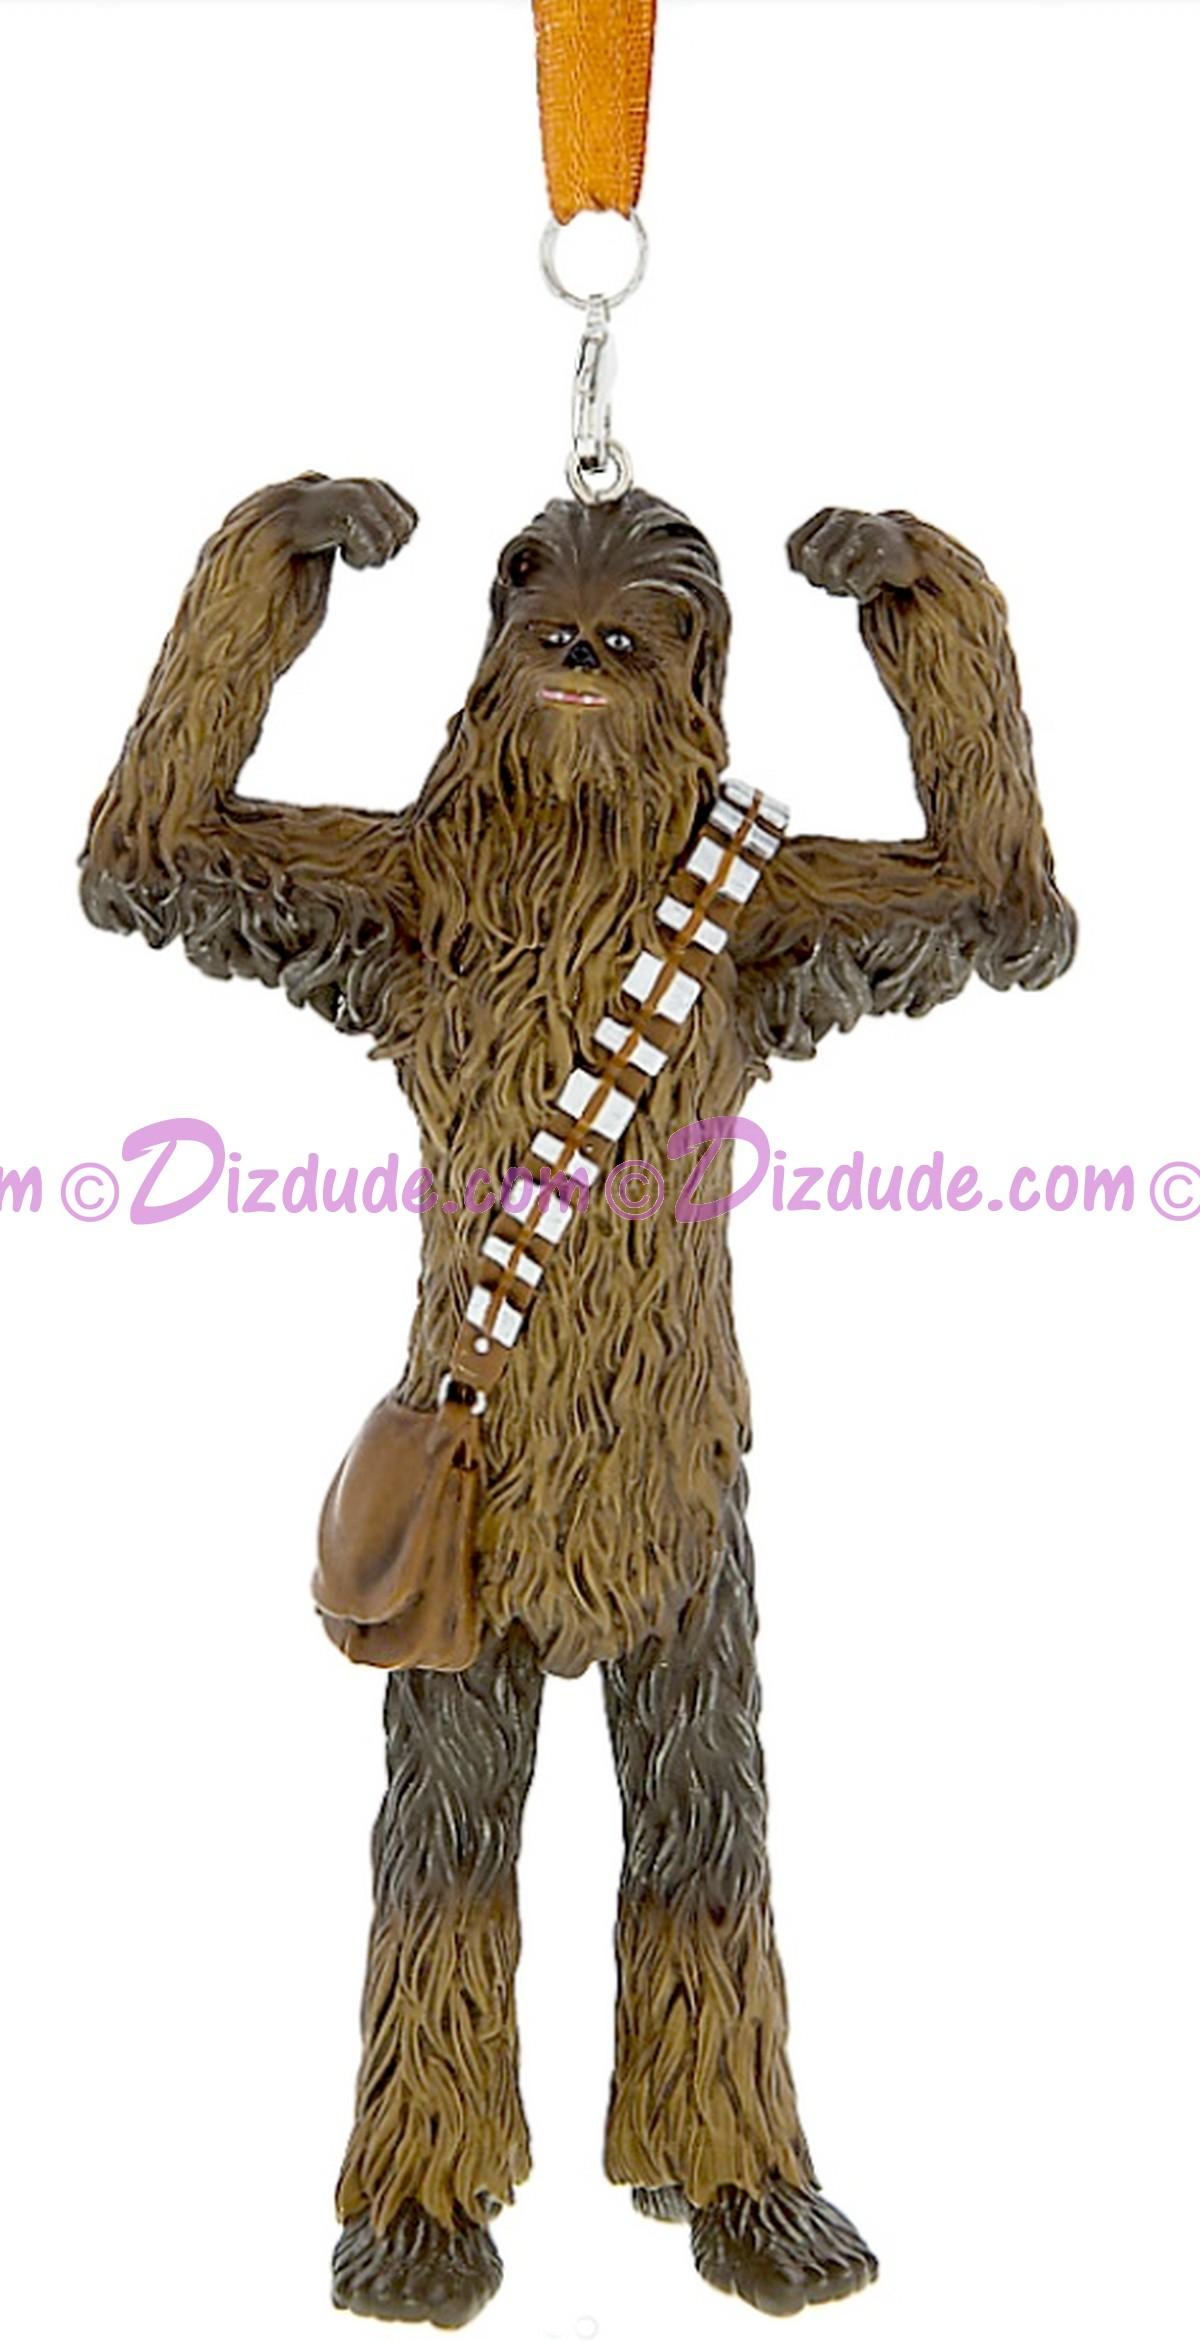 Chewbacca 3D Christmas Ornament - Disney Star Wars: The Force Awakens © Dizdude.com